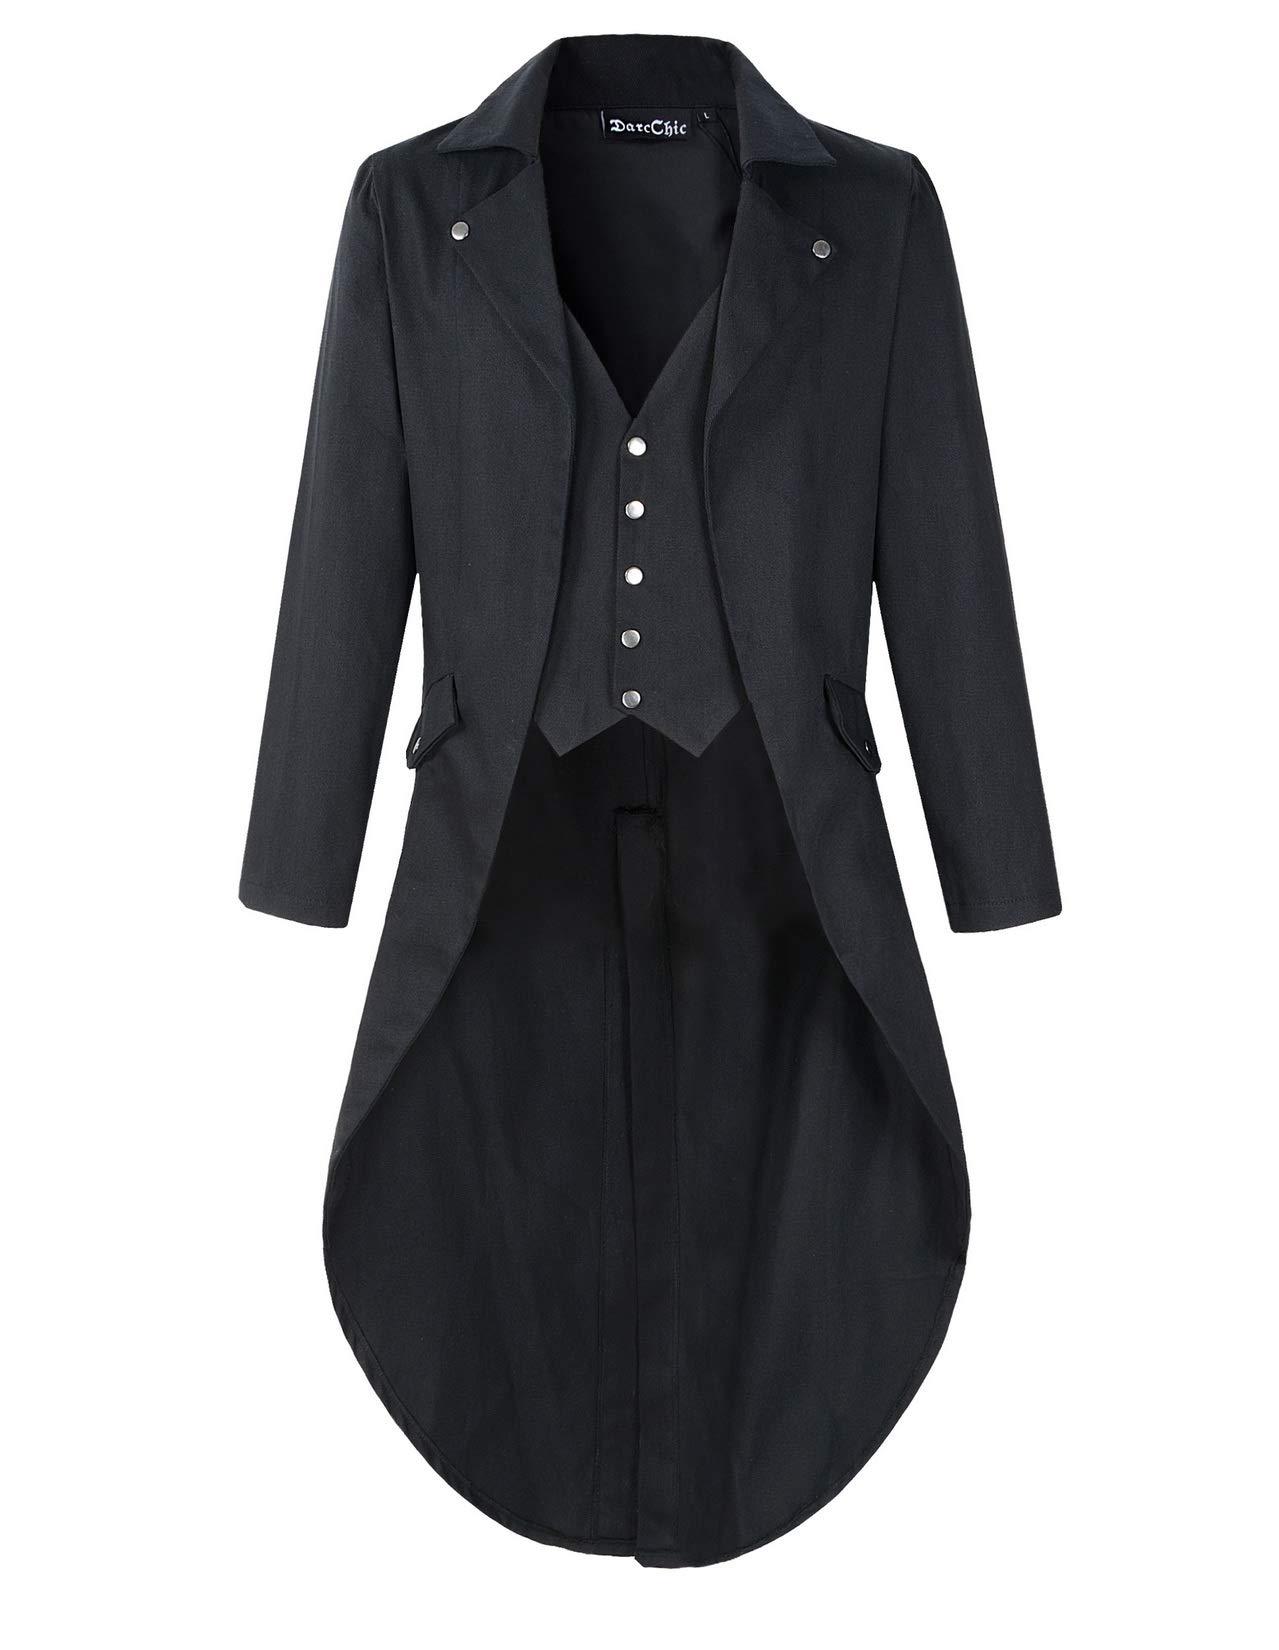 DarcChic Mens Gothic Tailcoat Jacket Black Steampunk VTG Victorian Coat (XL, Black) by DarcChic